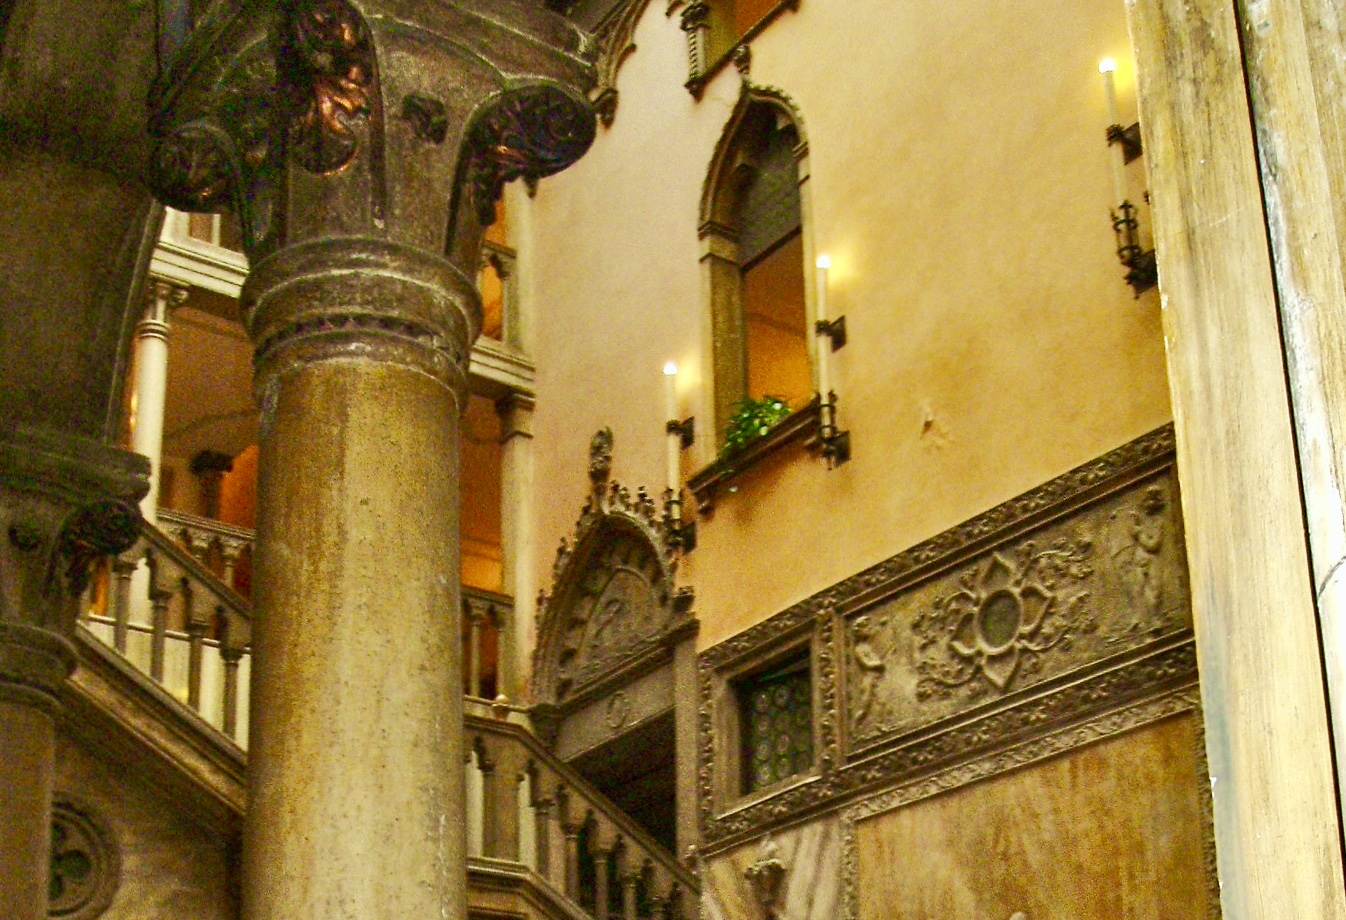 image of lobby at the Danieli Hotel in Venice